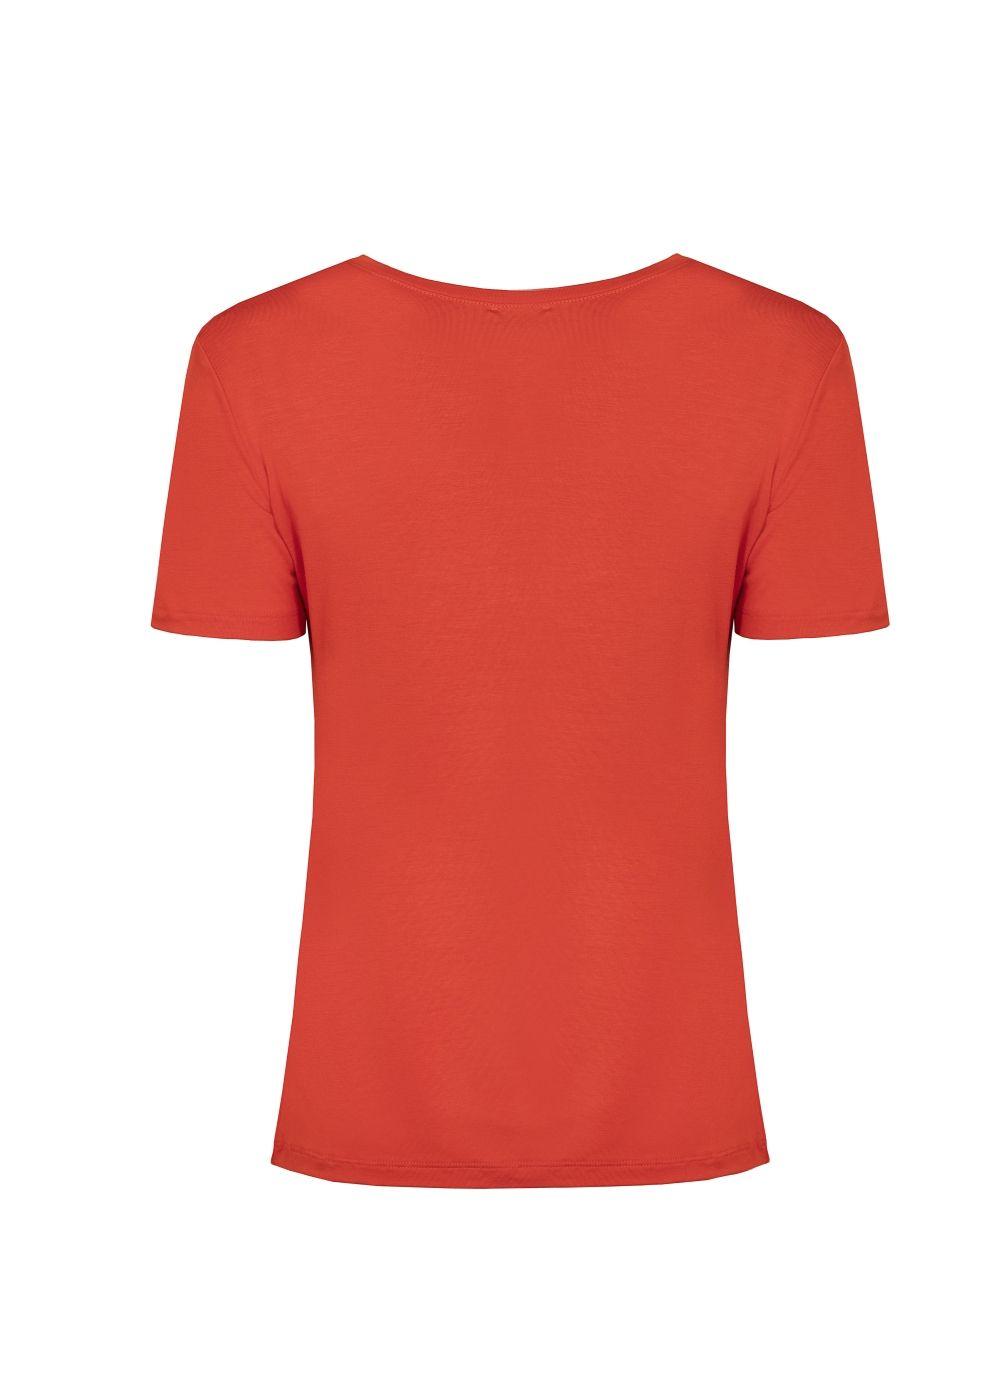 T-shirt damski TSHDT-0025-41(W19)